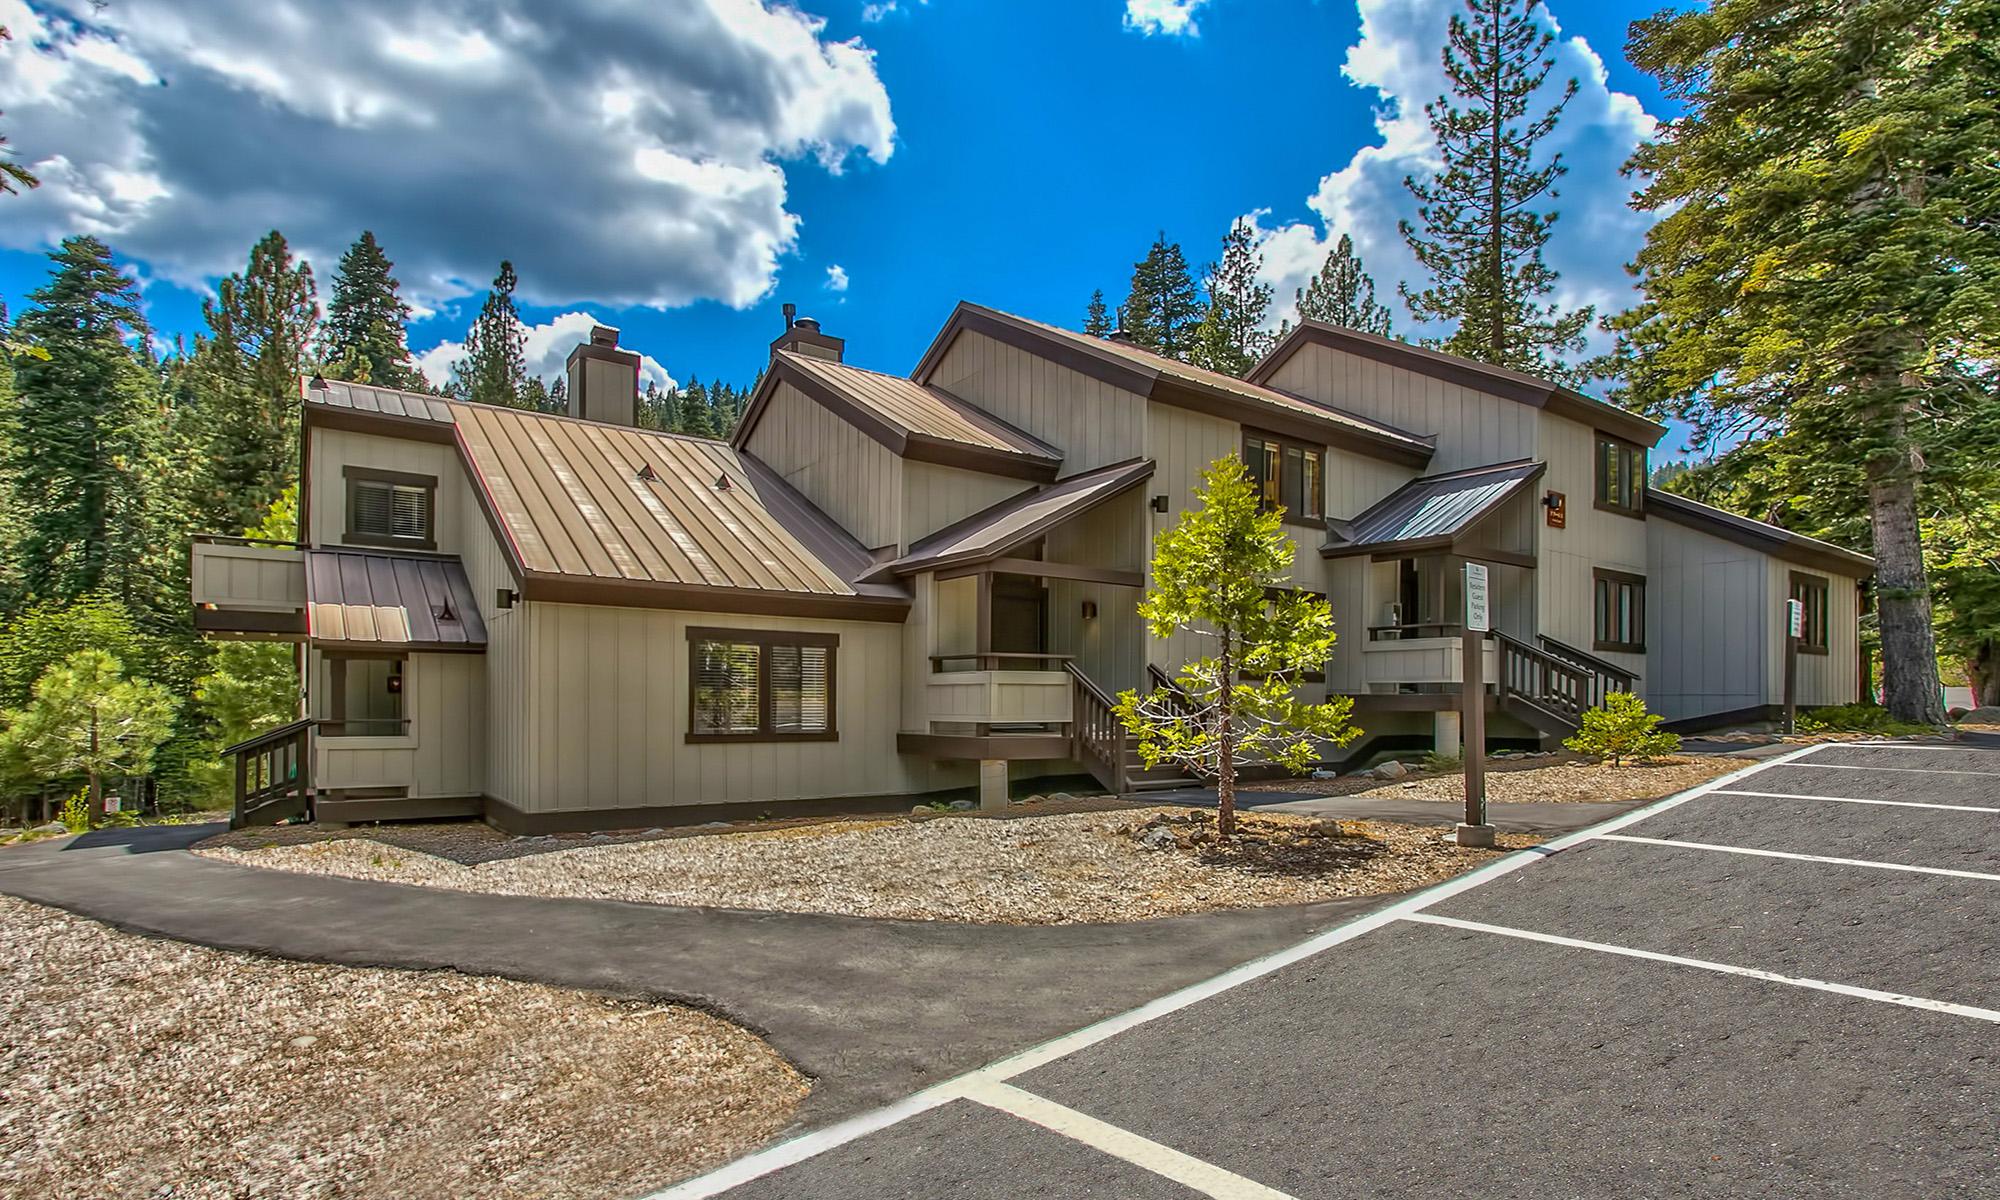 Condominium for Sale at 725 Granlibakken Road #78 Tahoe City, California 96145 United States